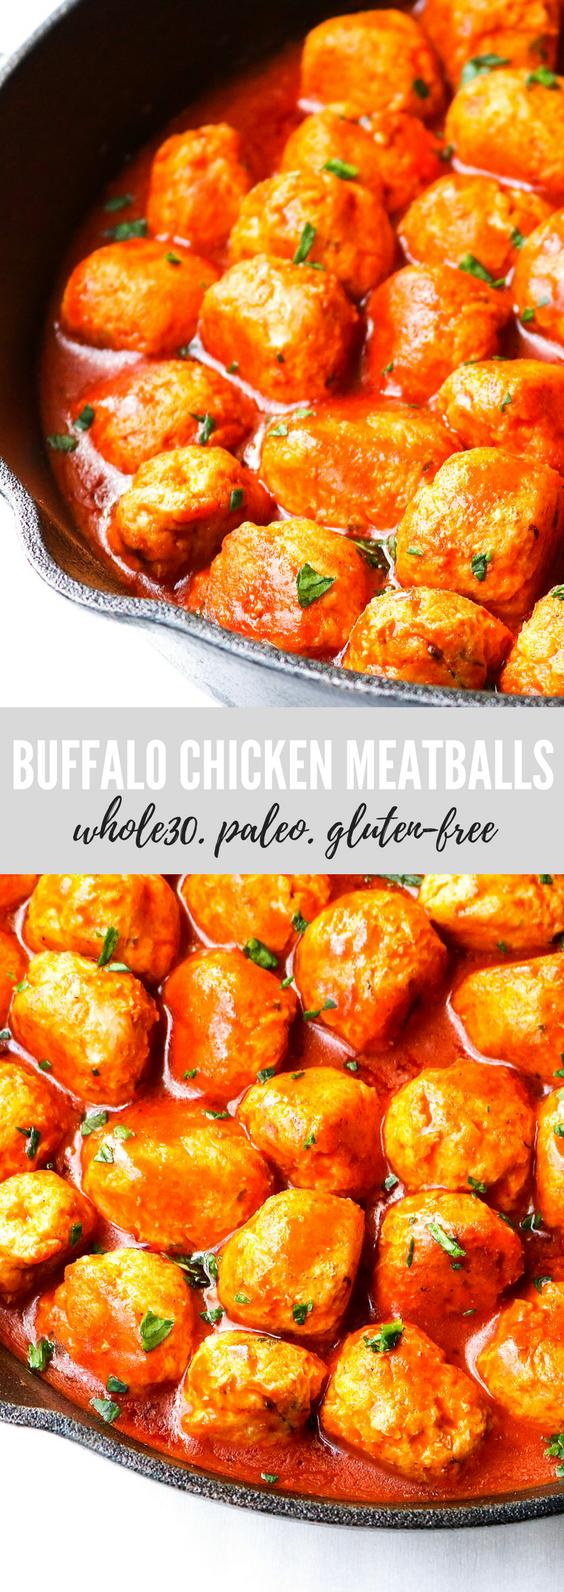 Buffalo Chicken Meatballs.png